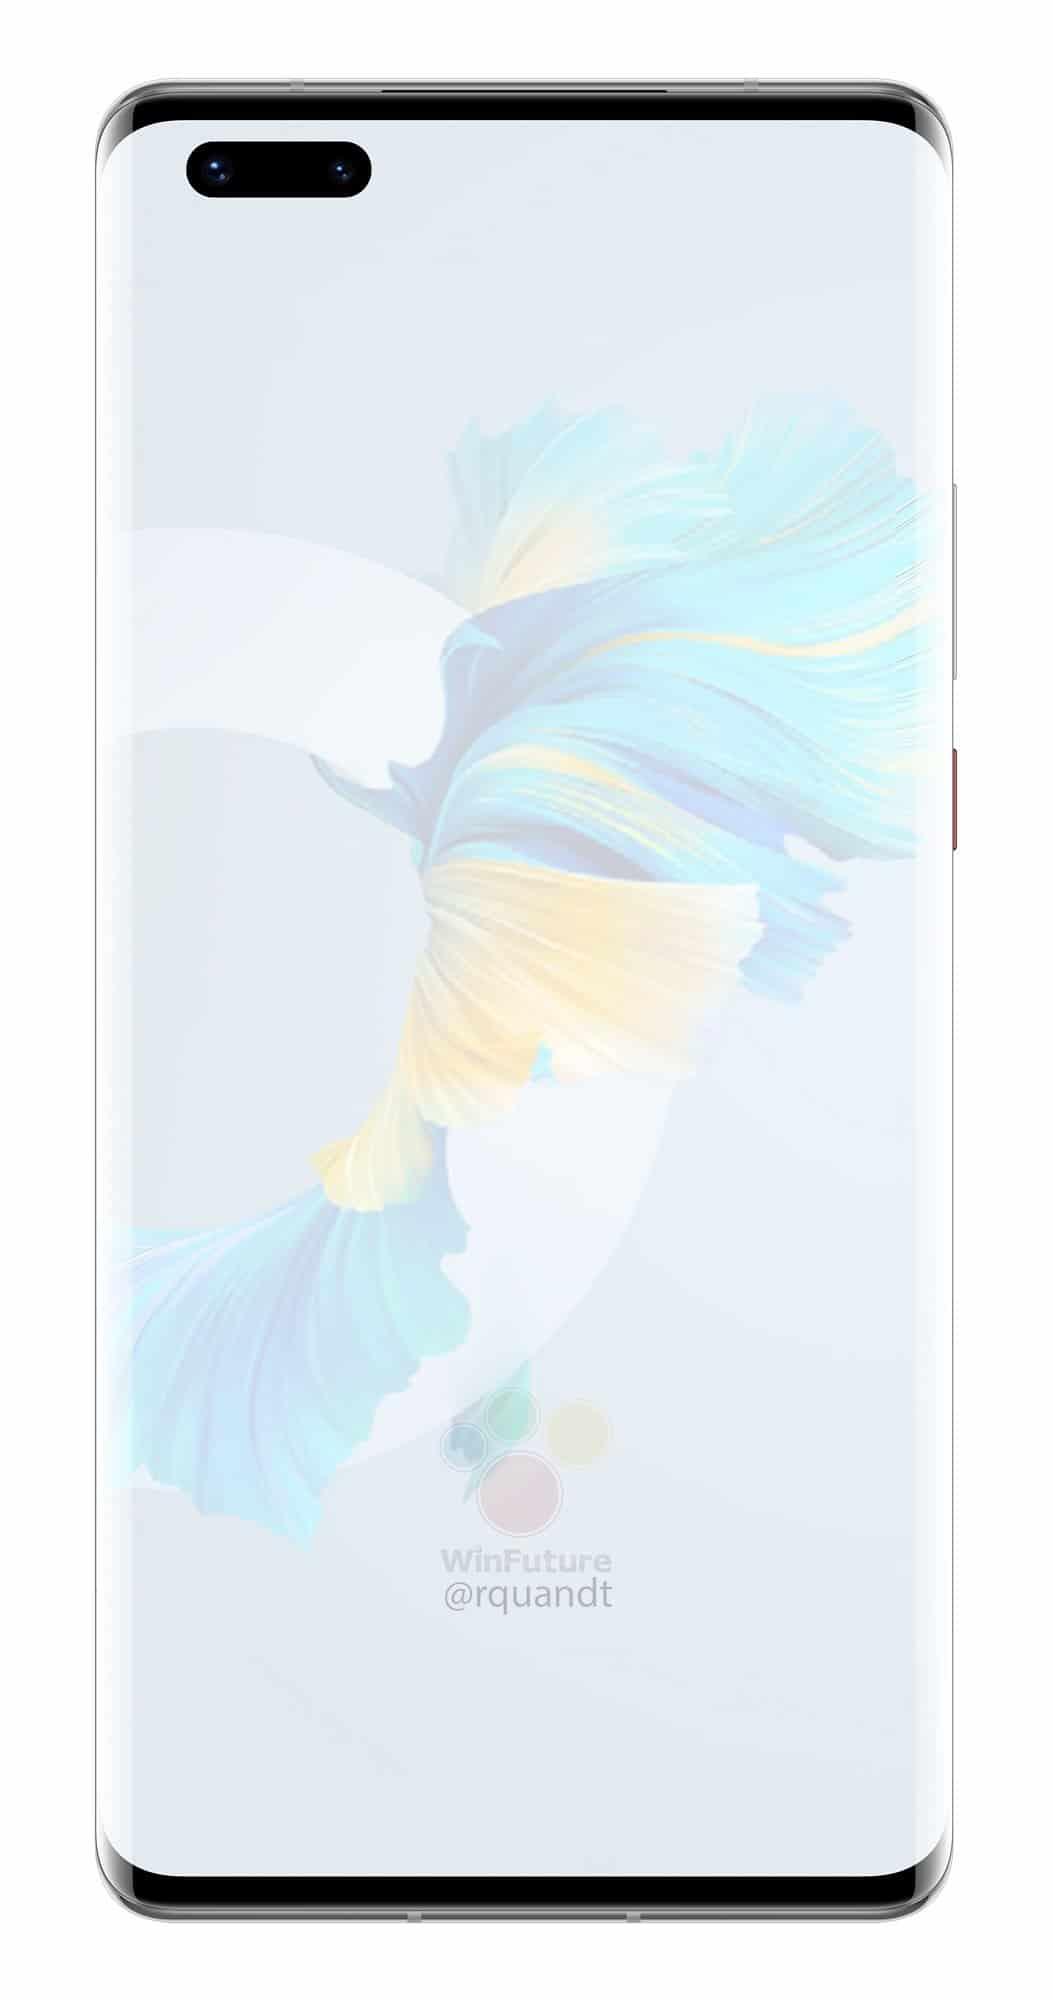 Huawei Mate 40 Pro leak 12